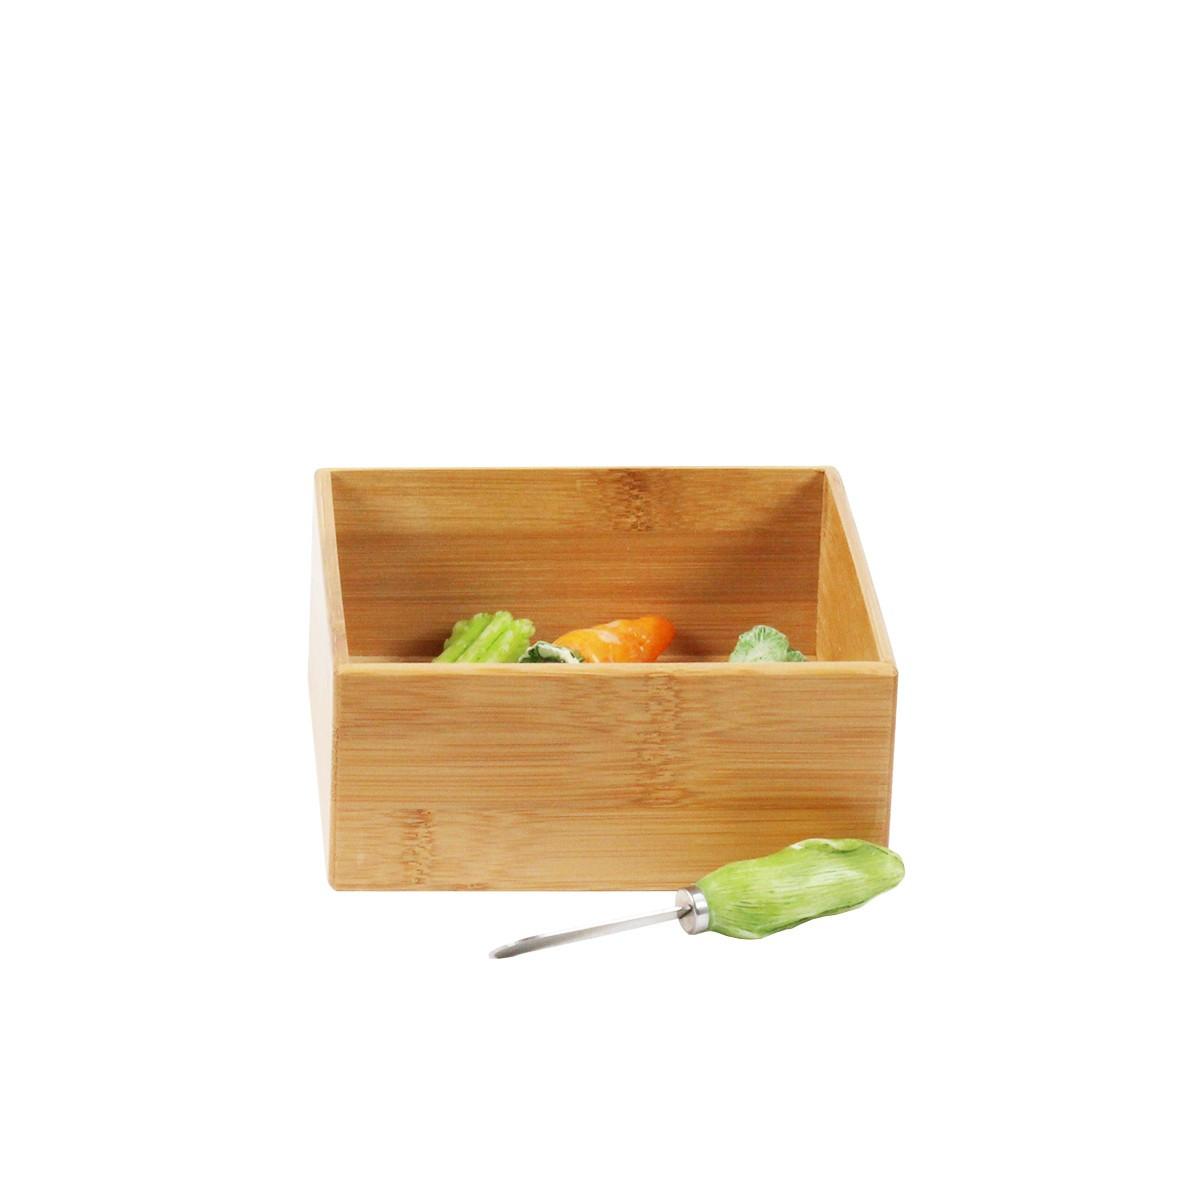 grand de tiroirs carr et en bambou with organiseur tiroir cuisine. Black Bedroom Furniture Sets. Home Design Ideas